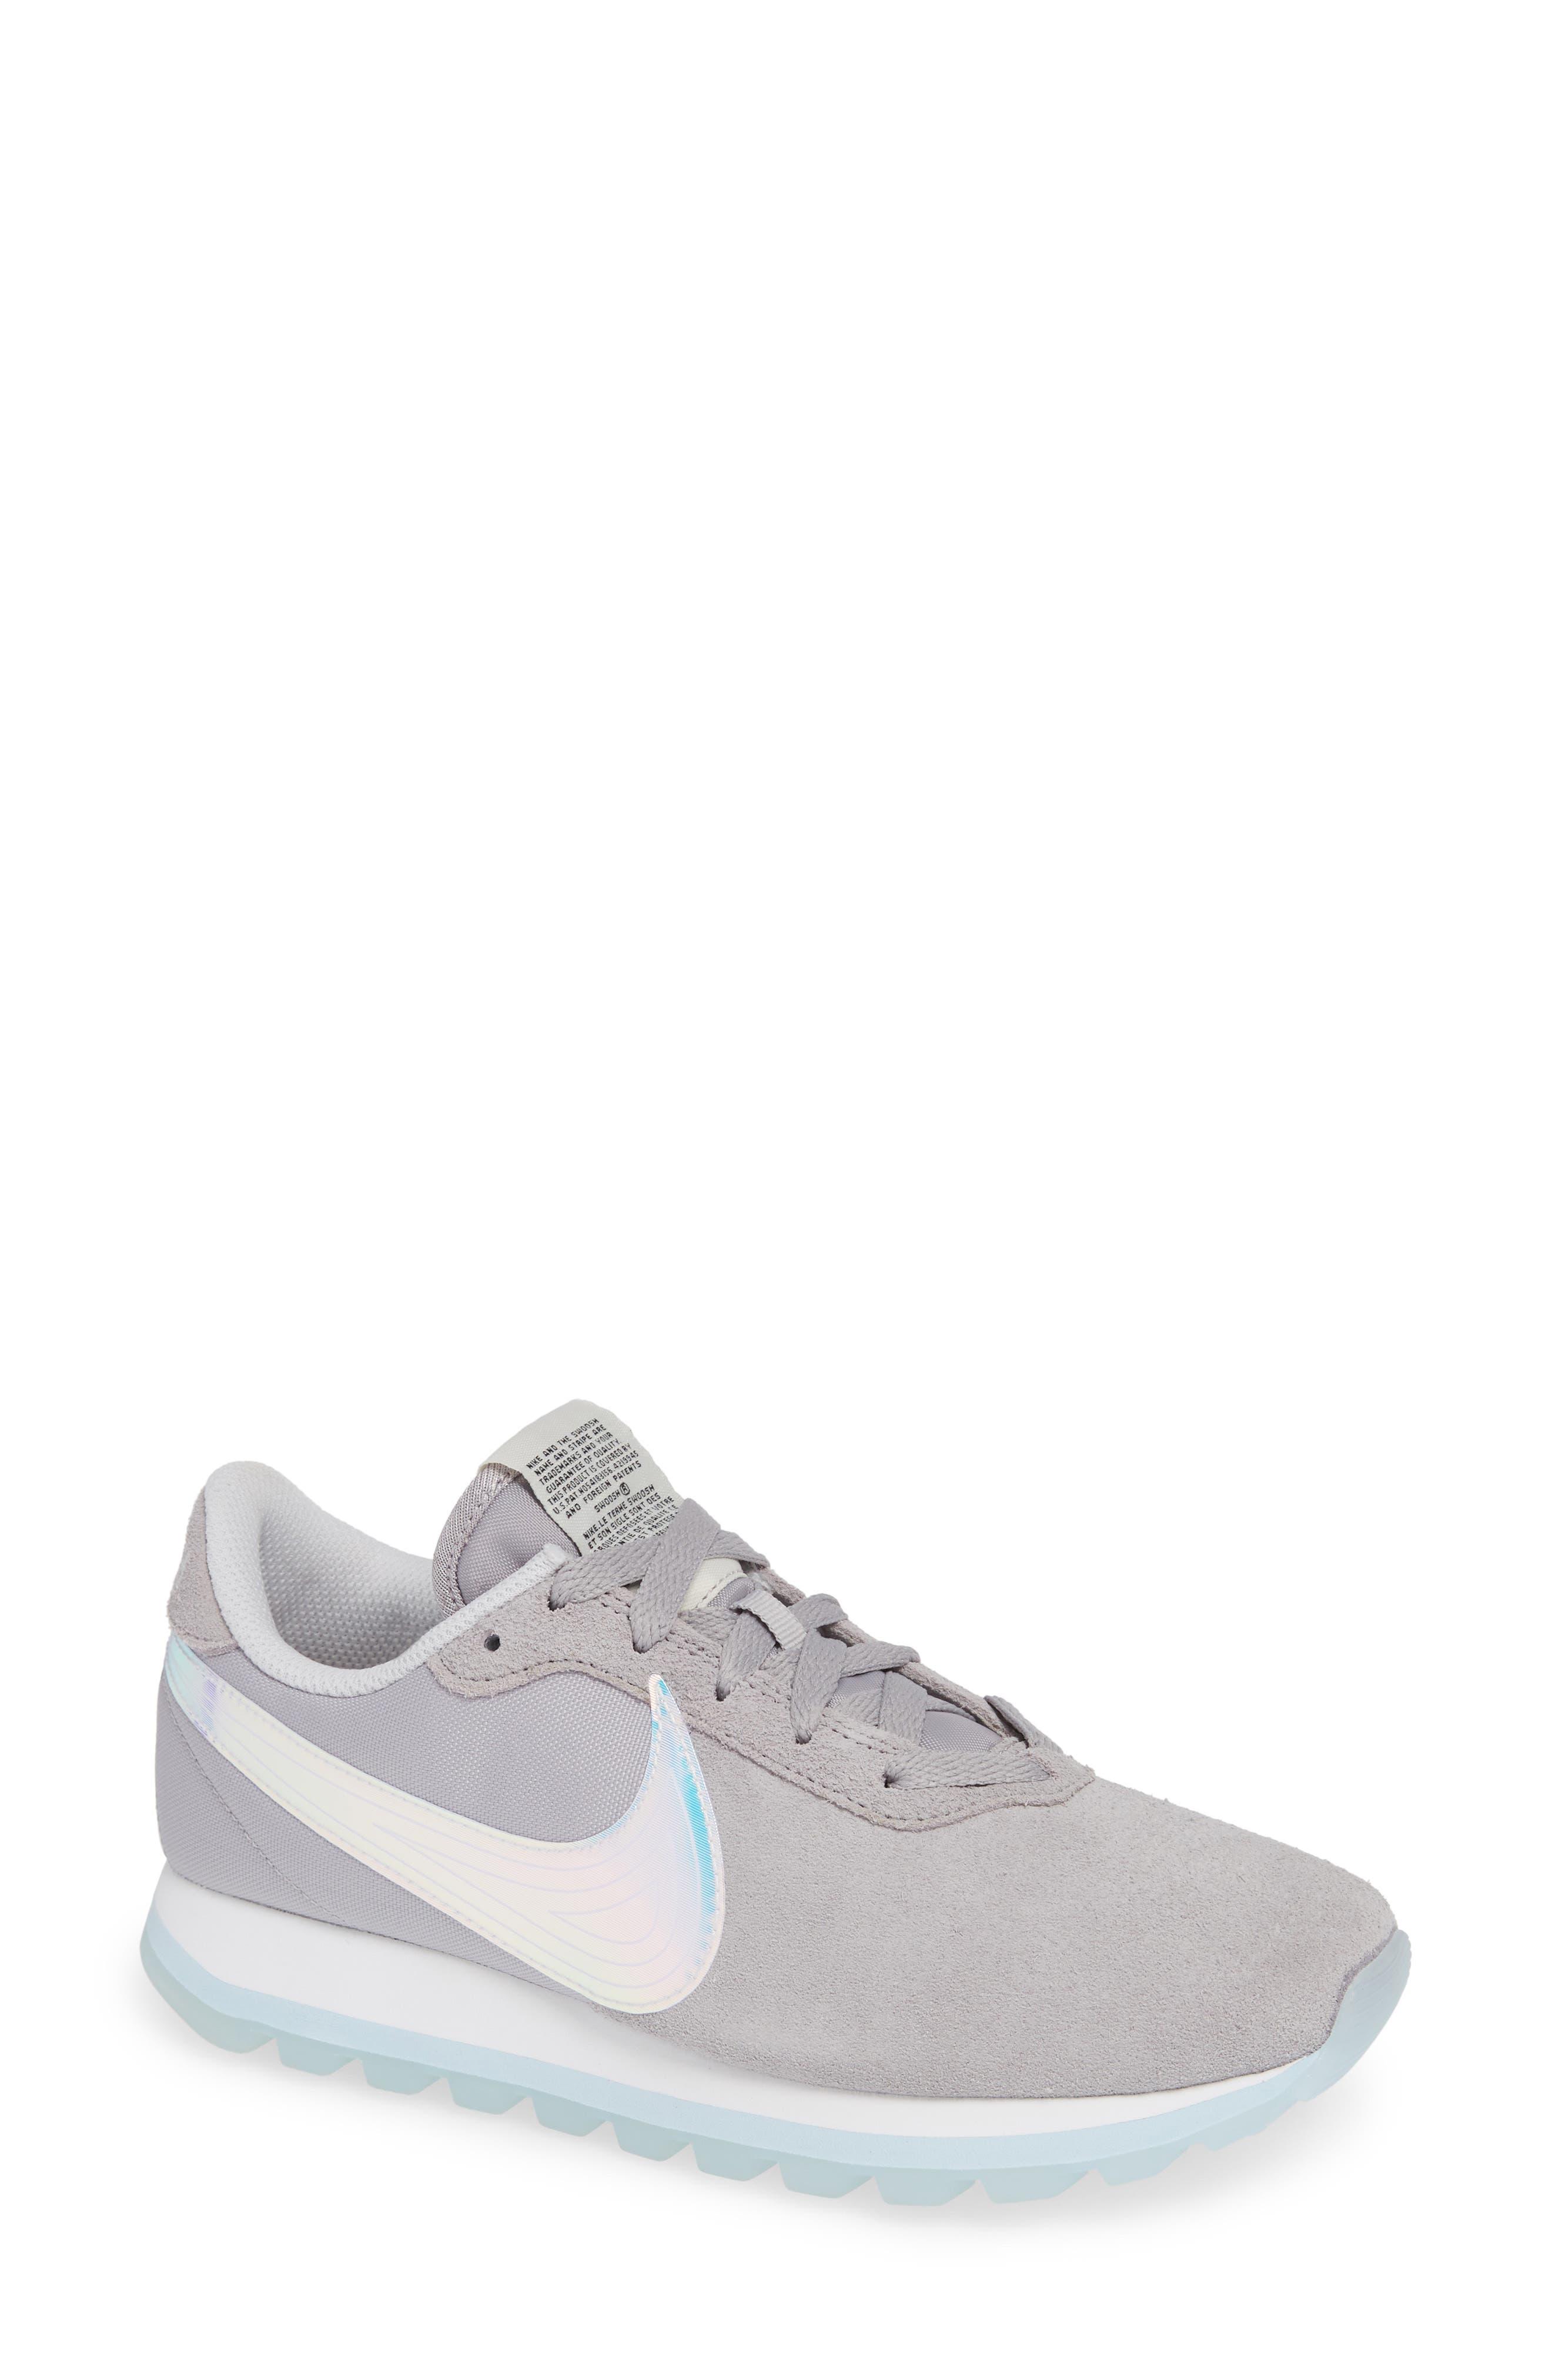 Pre Love O.X. Sneaker,                         Main,                         color, ATMOSPHERE GREY/ WHITE/ GREY